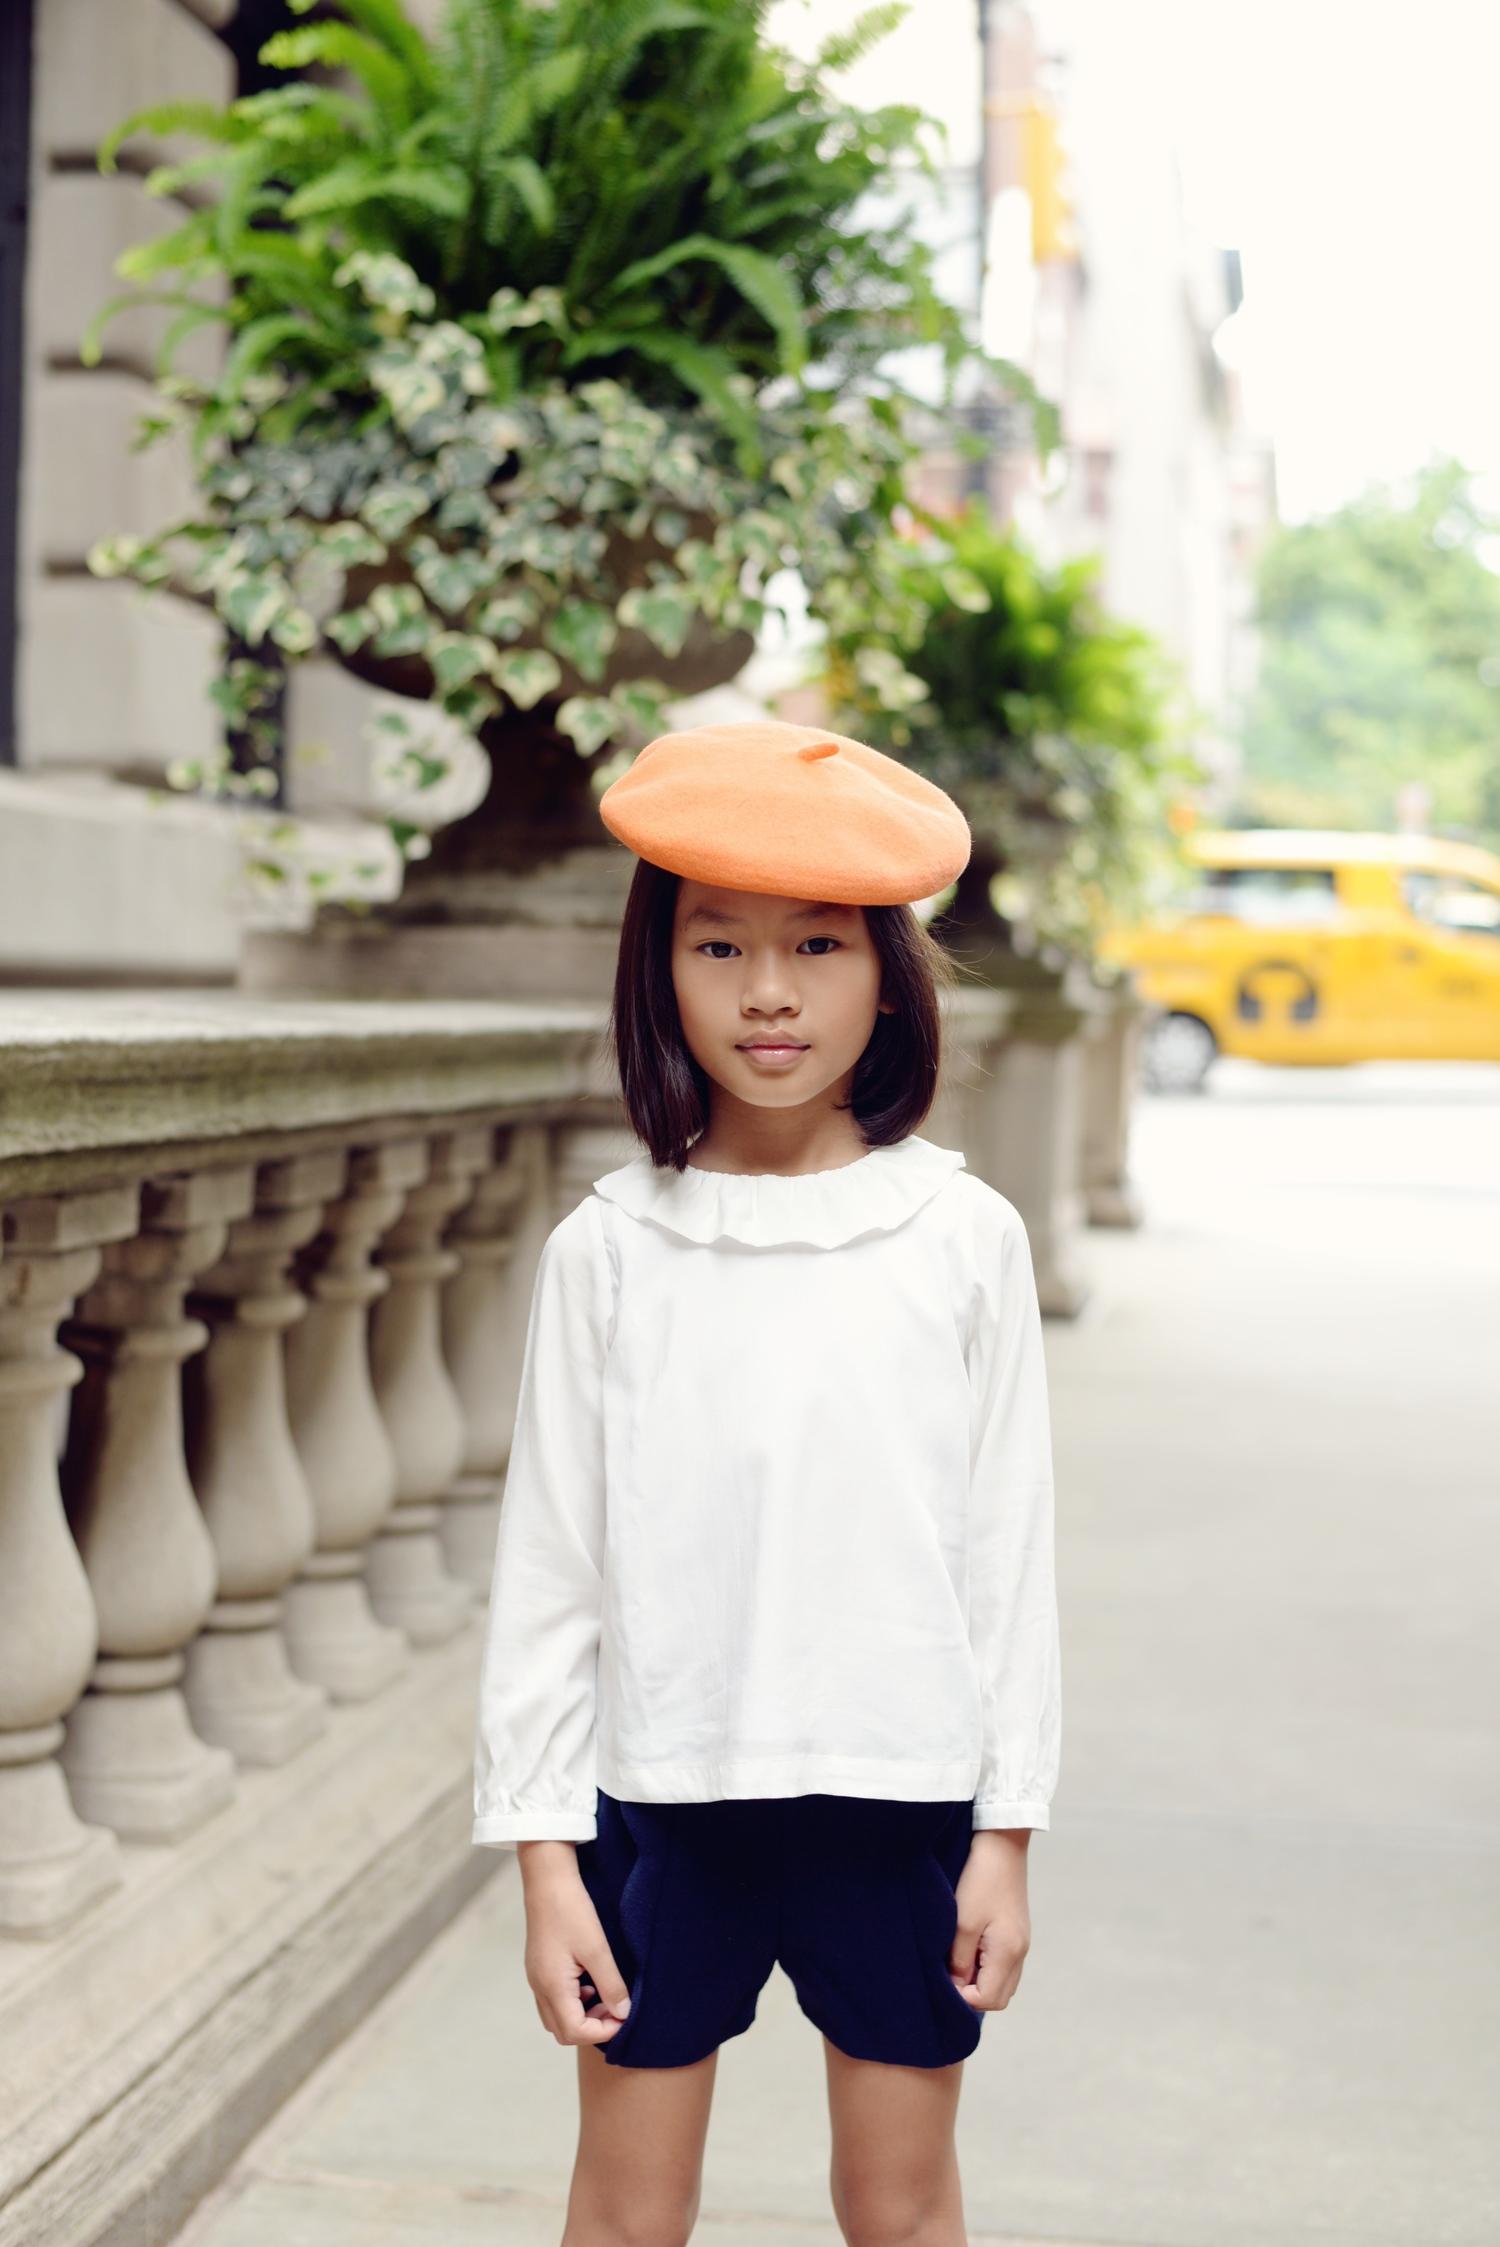 Enfant+Street+Style+by+Gina+Kim+Photography-60.jpeg